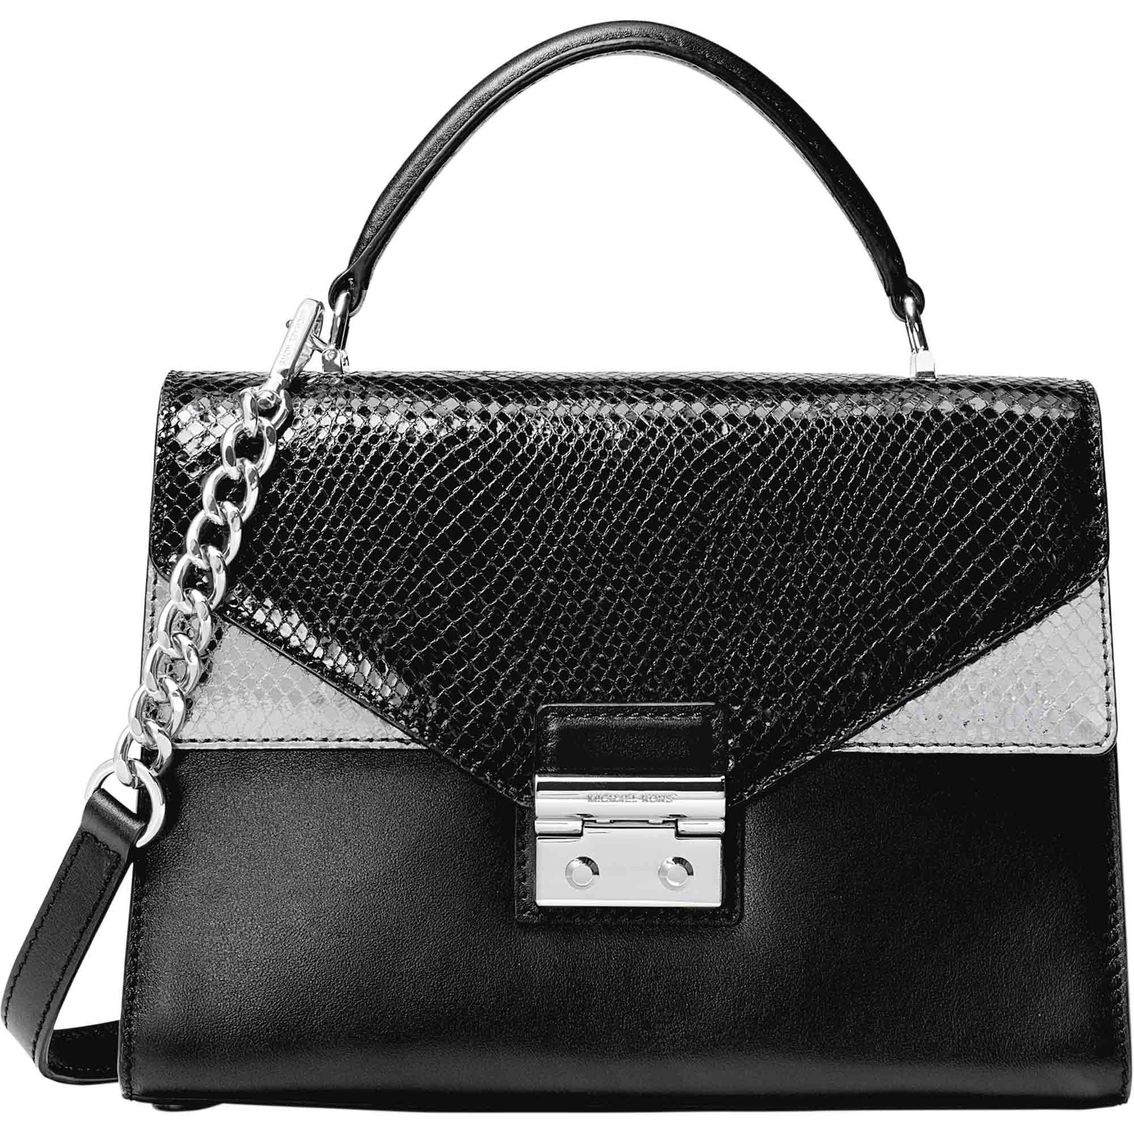 a32c67977 Michael Kors Sloan Medium Double Flap Top Handle Satchel   Handbags ...